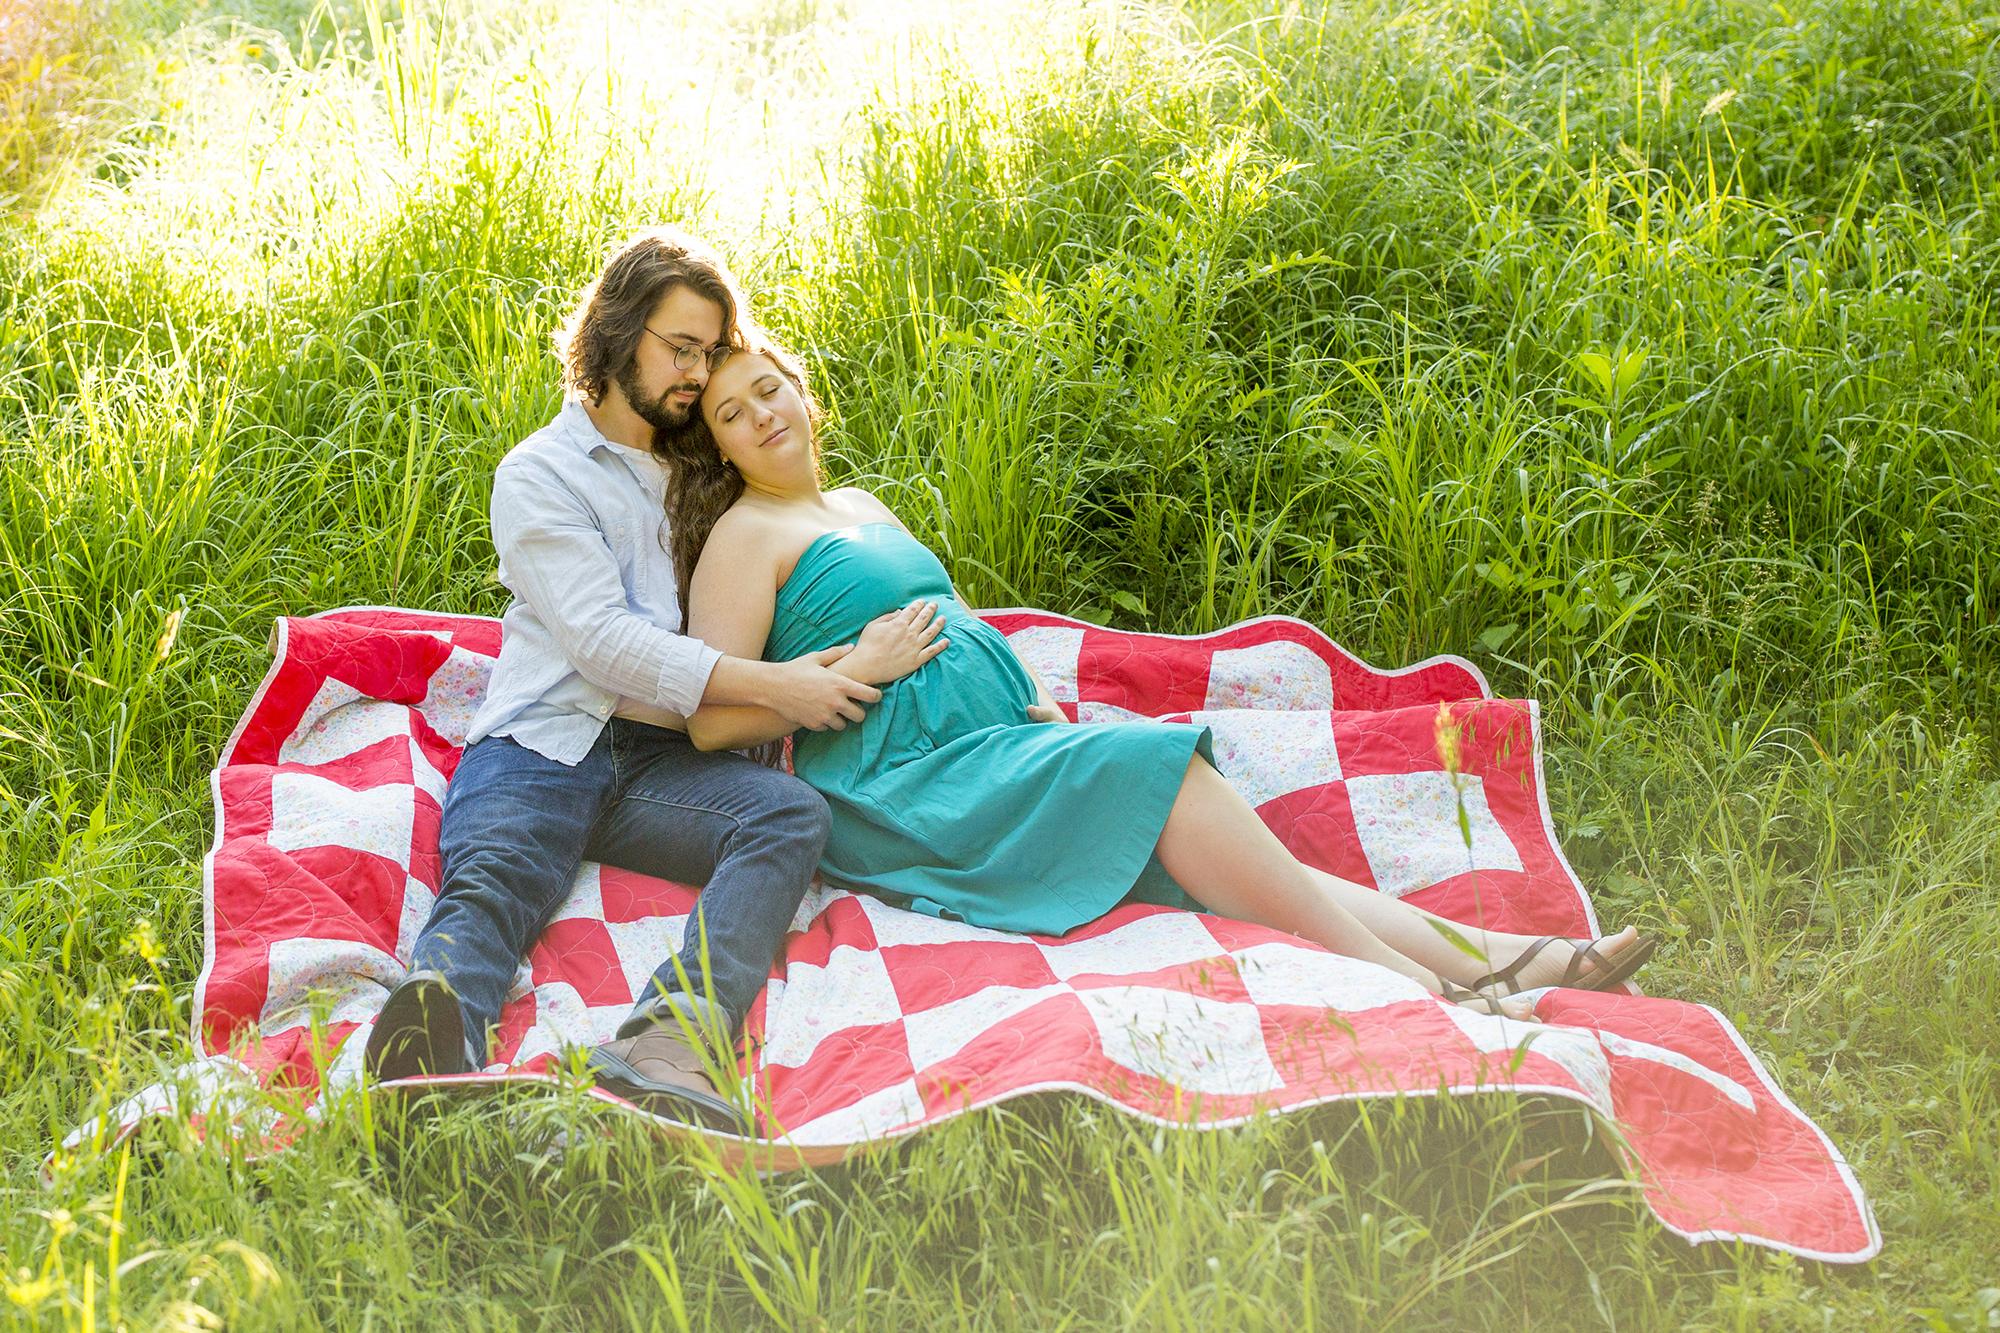 Seriously_Sabrina_Photography_Lexington_Kentucky_Maternity_Portraits_McConnell_Springs_Pagano10.jpg